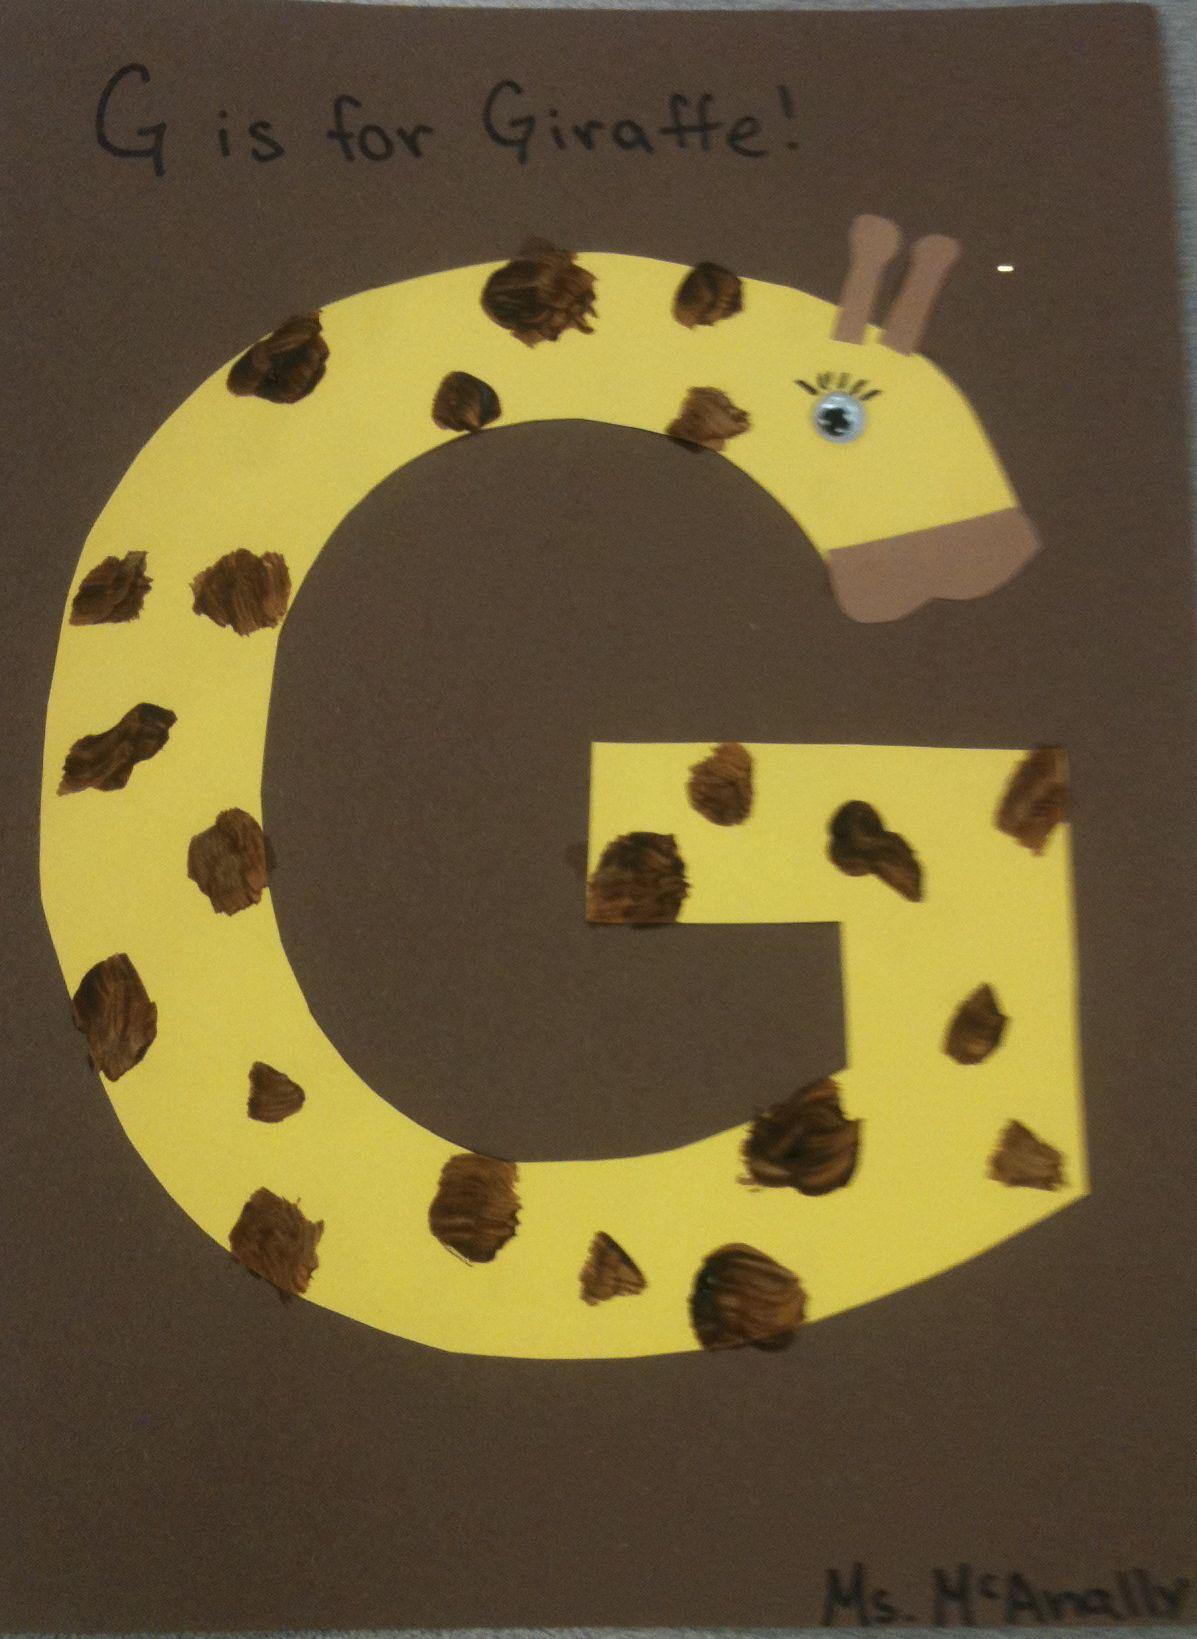 I Design Animals For Each Letter Of The Week G Is For Giraffe